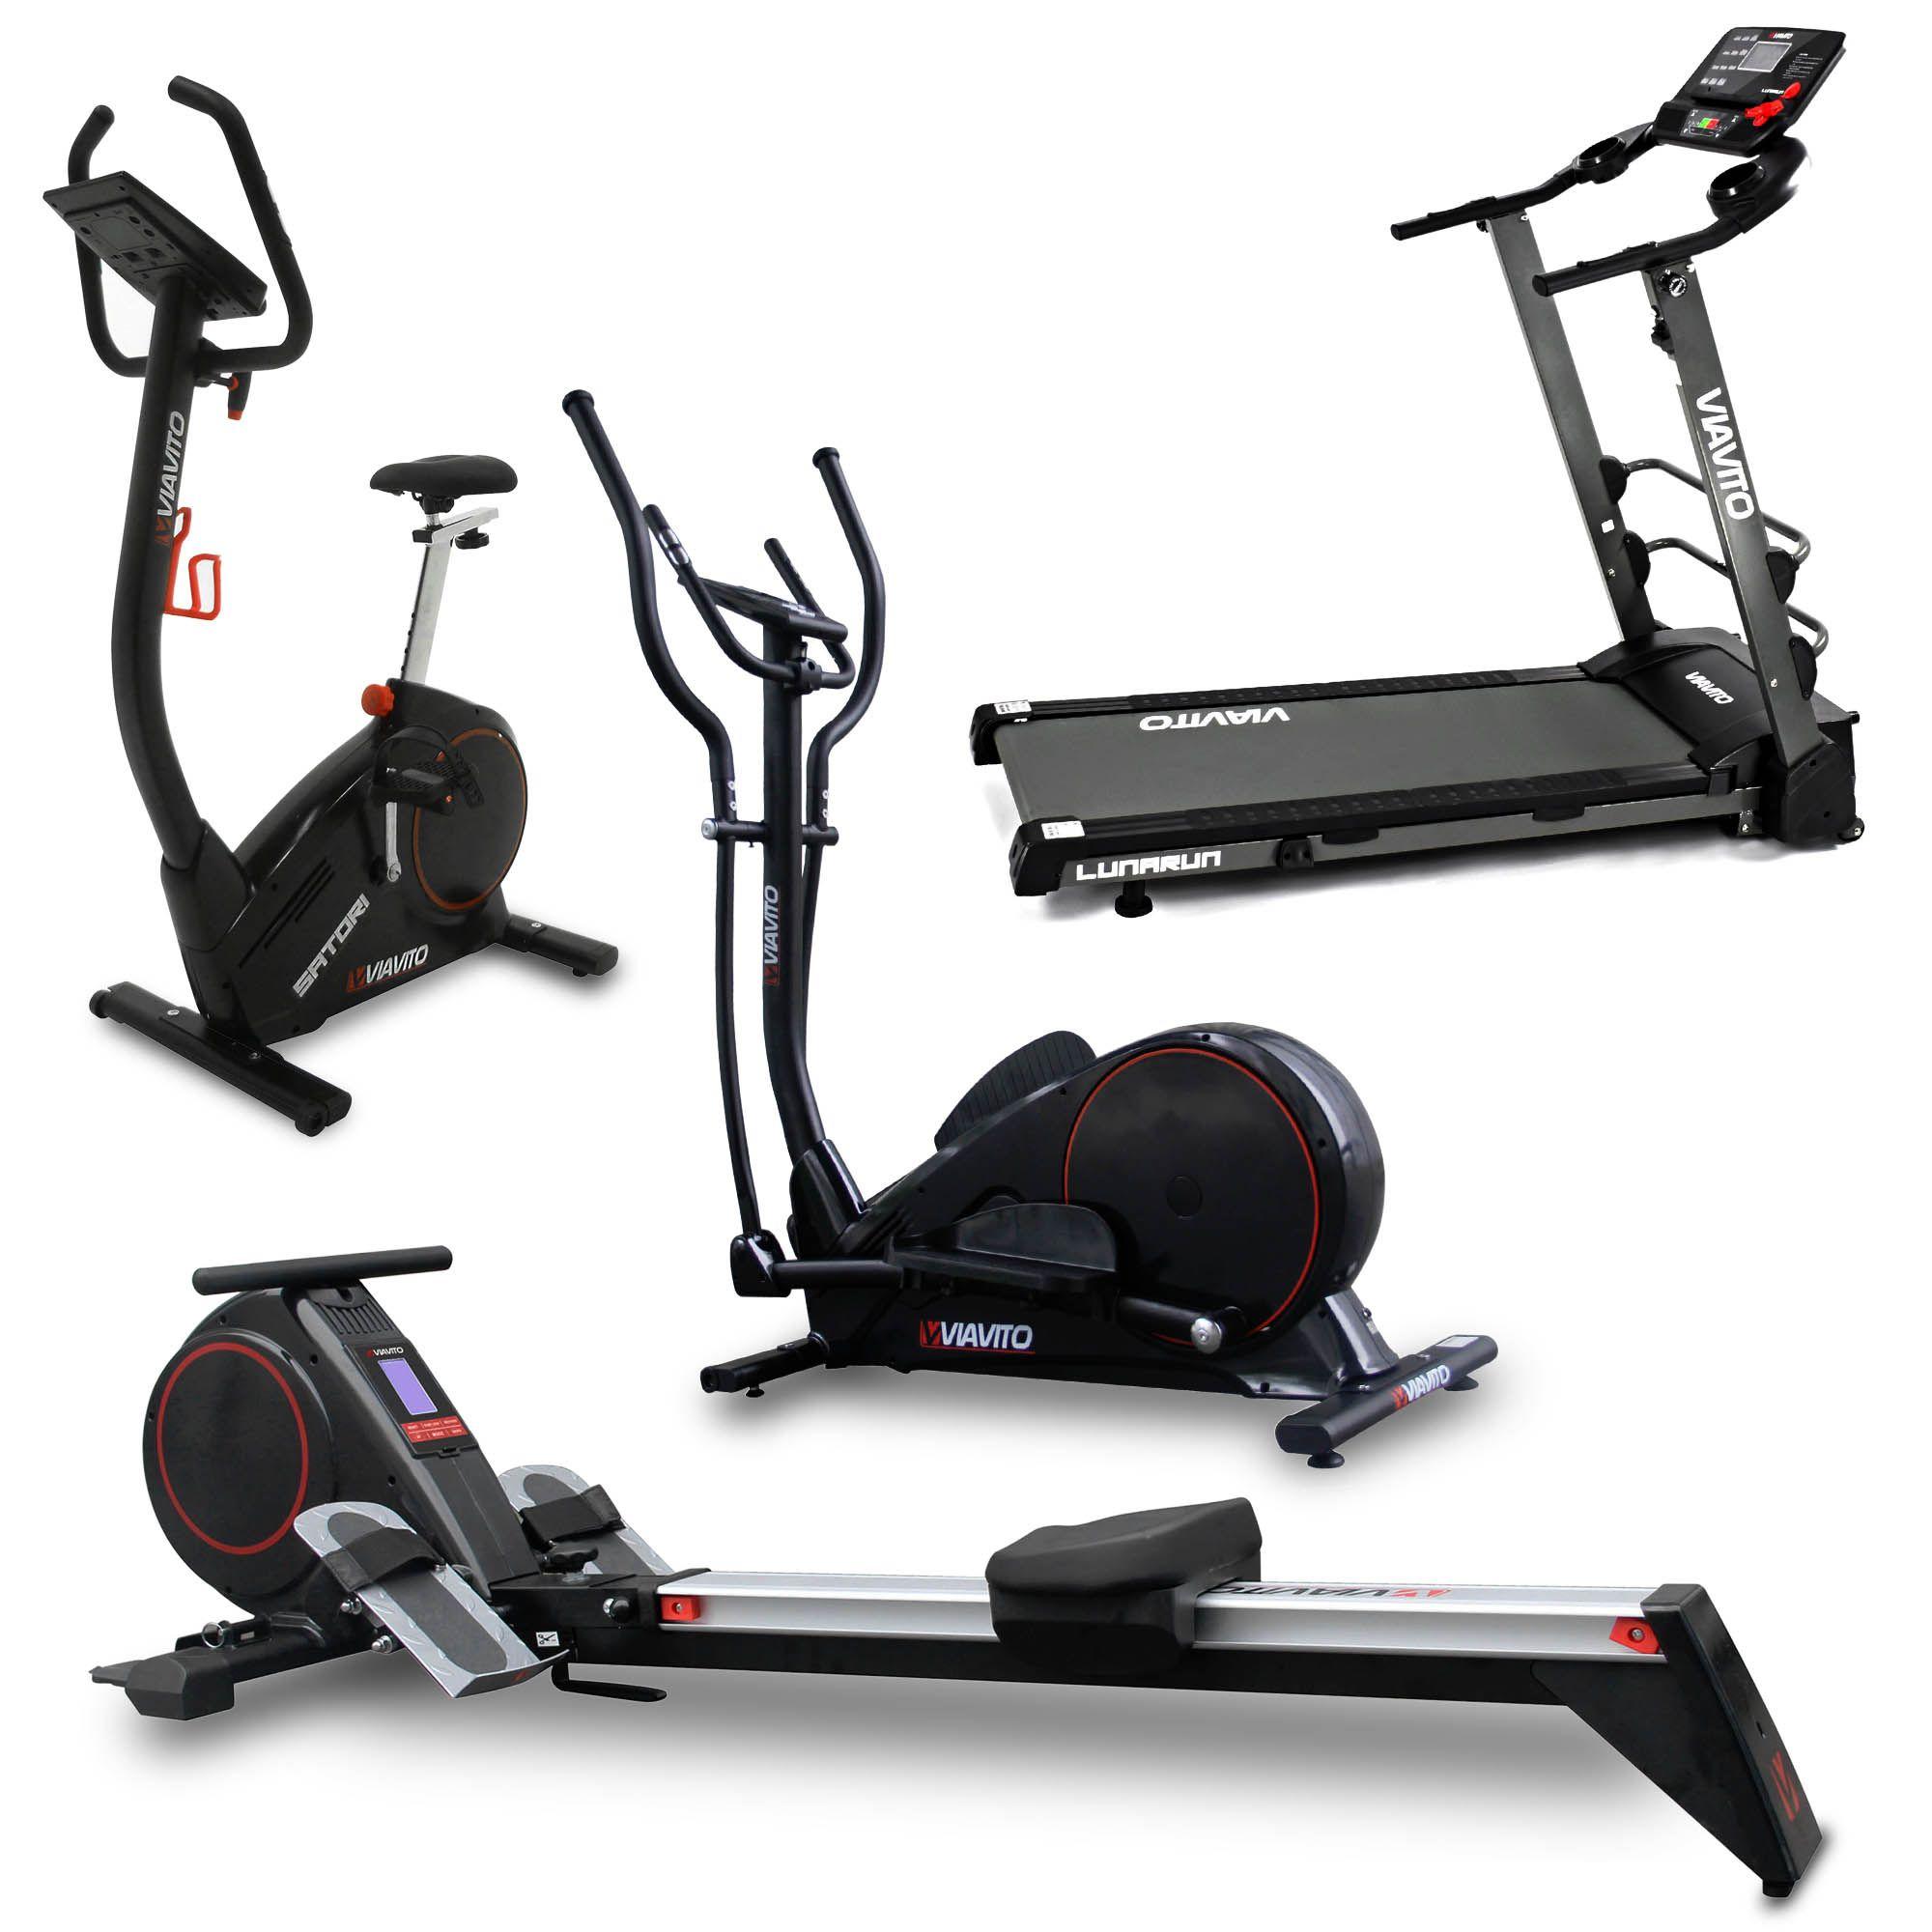 viavito complete home fitness set. Black Bedroom Furniture Sets. Home Design Ideas